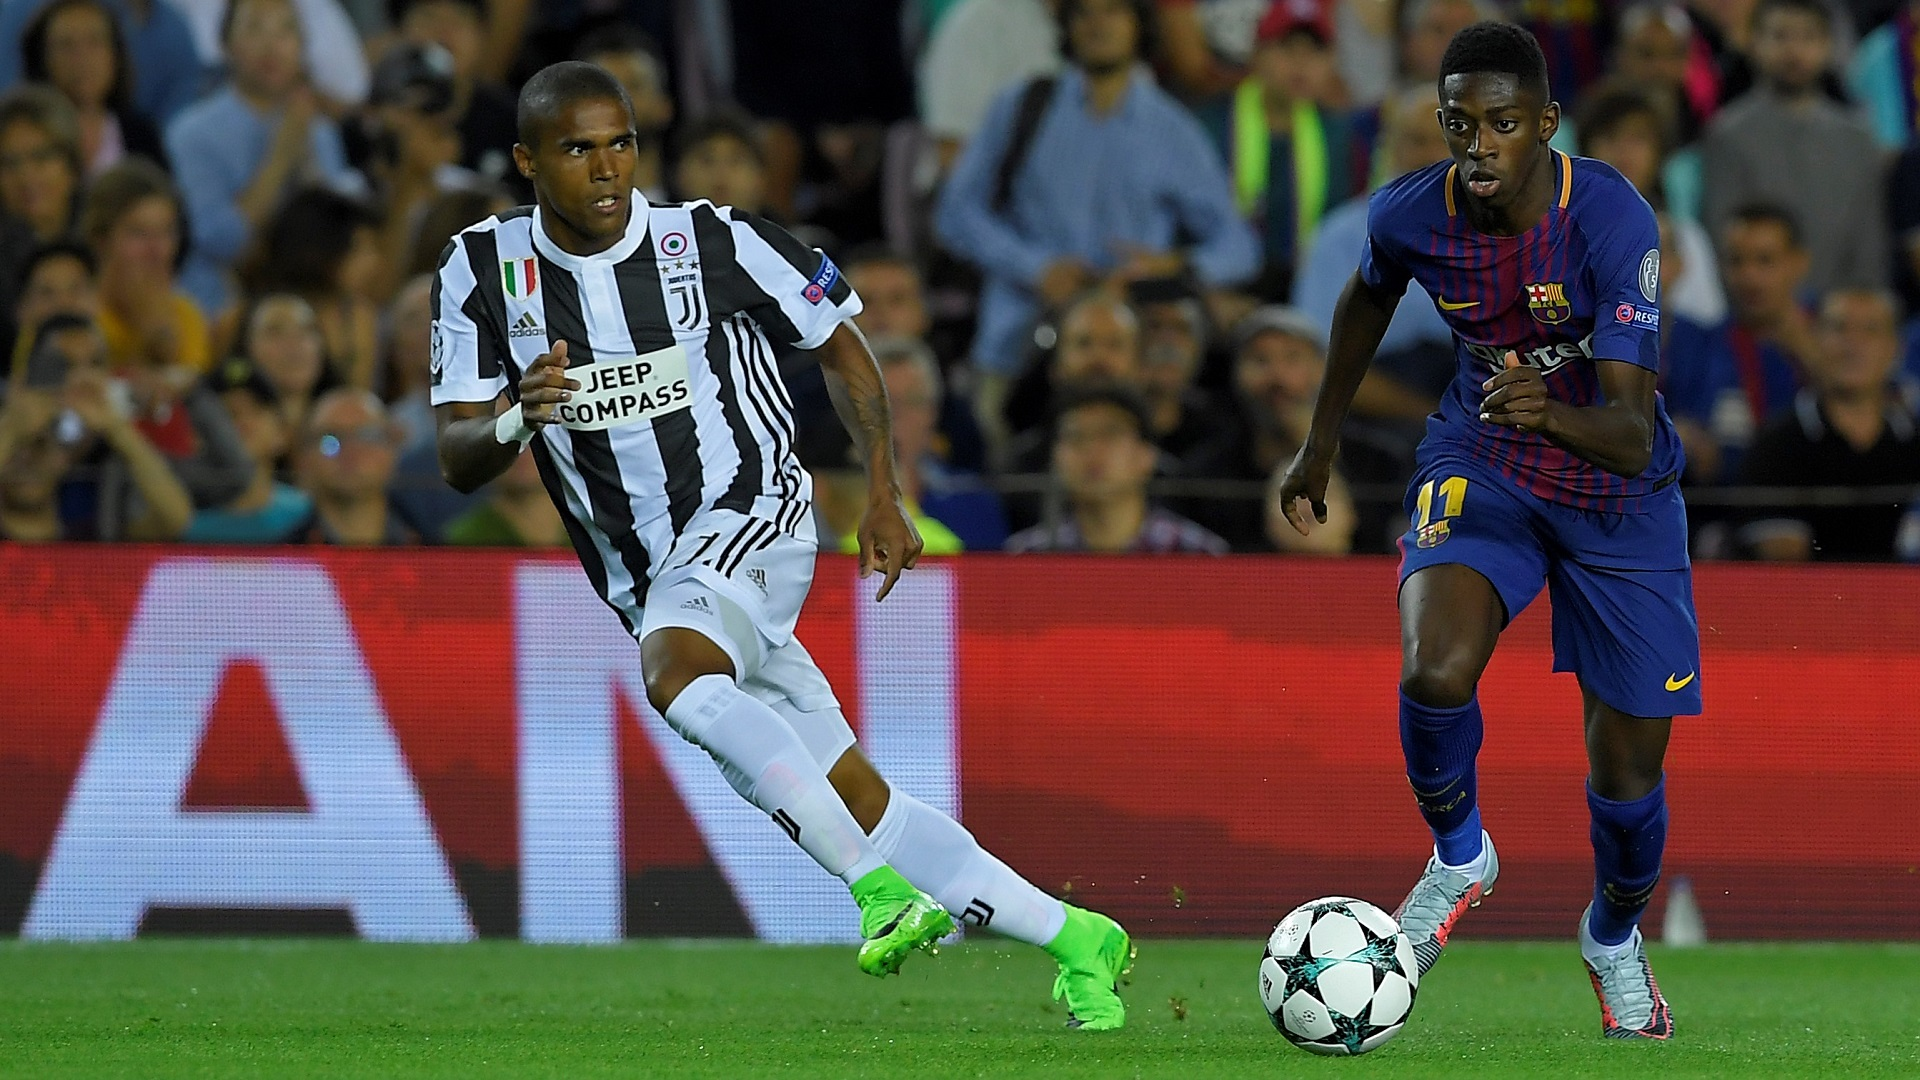 Ousmane Dembele Douglas Costa Barcelona Juventus Champions League 12092017